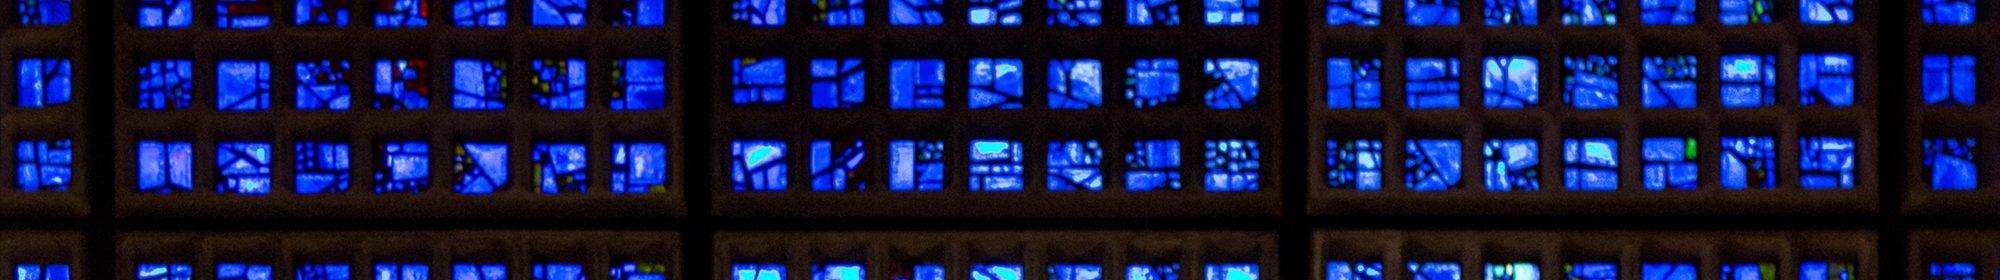 glass-geometric-church-v4.jpg